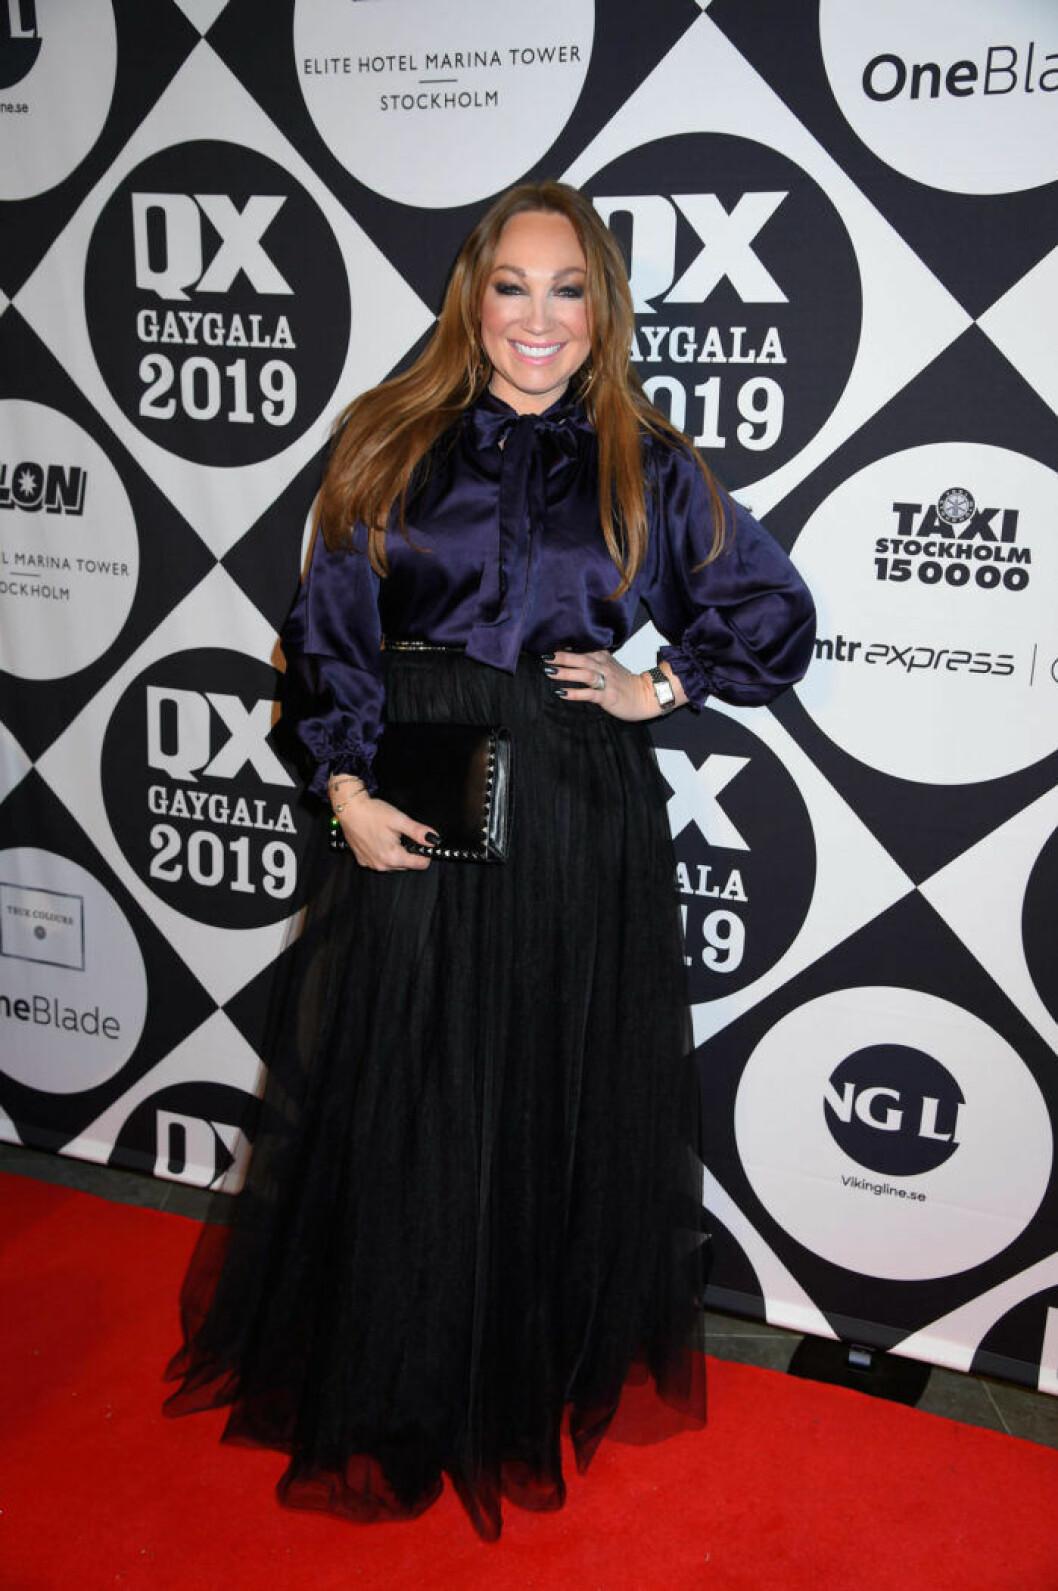 Charlotte Perrelli på QX-galan 2019